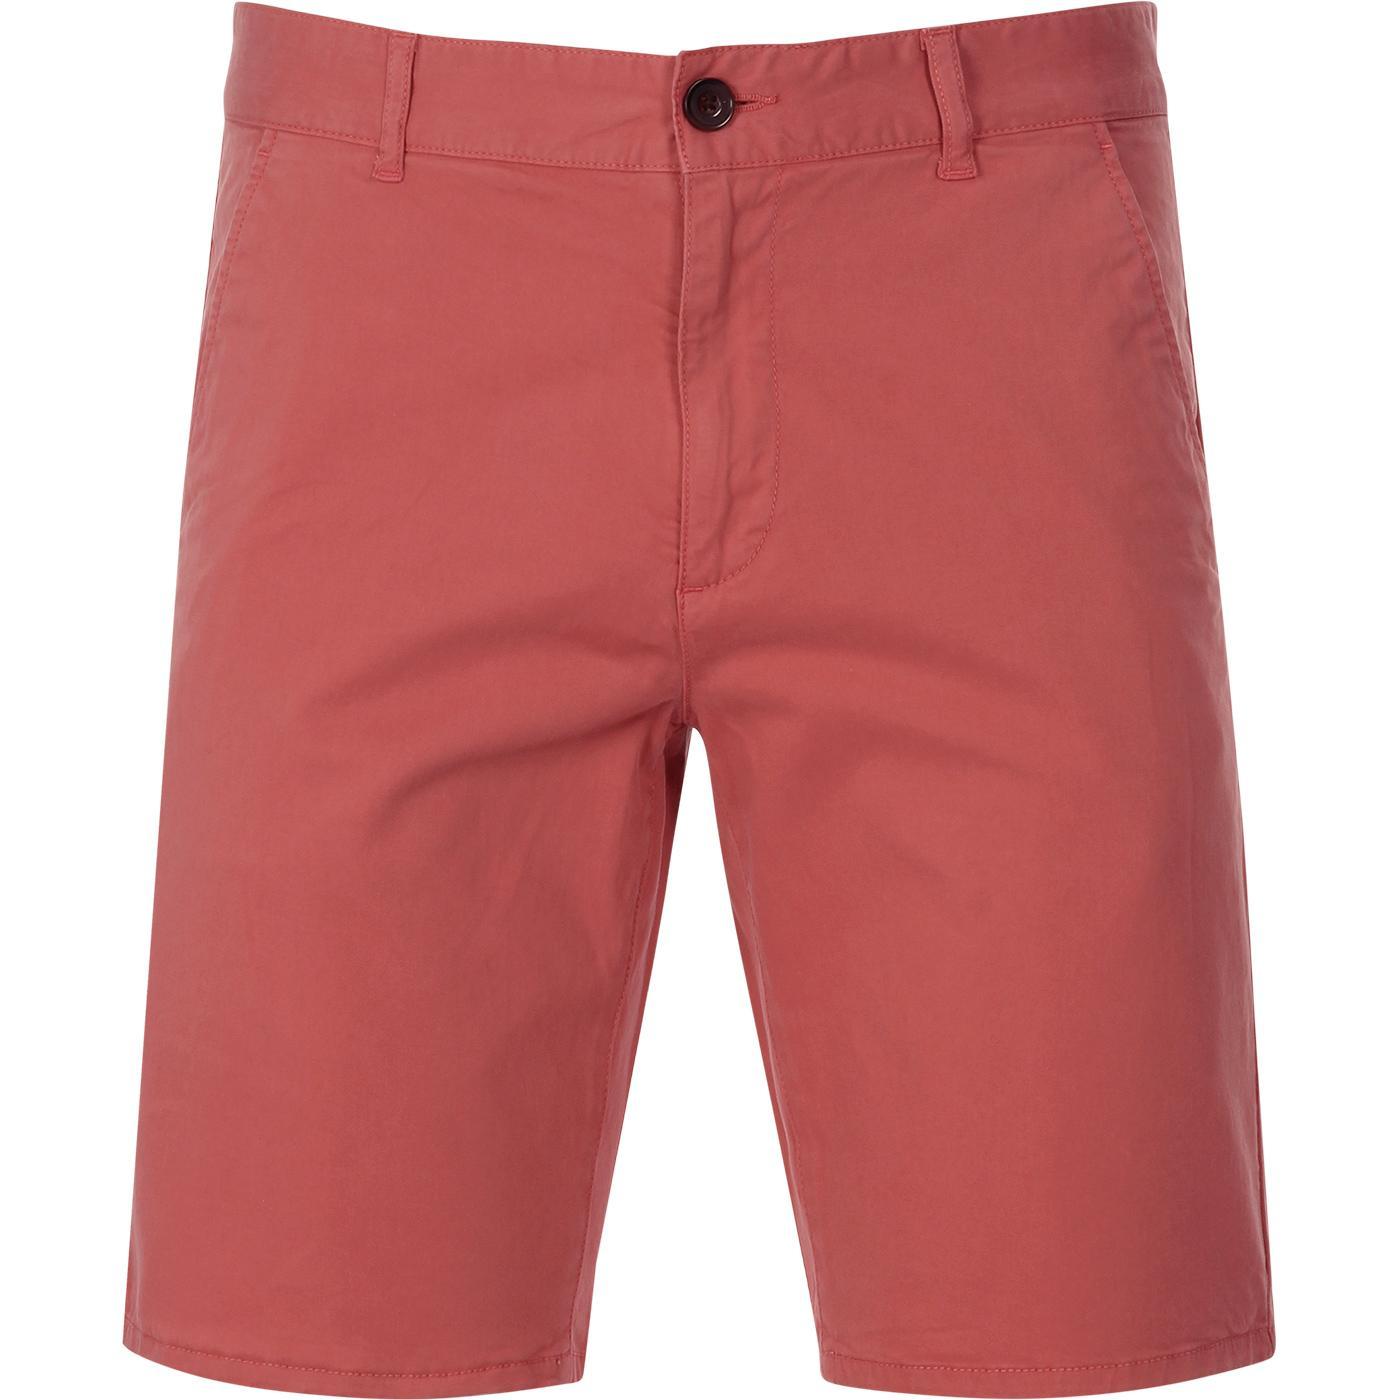 Hawk FARAH Men's Retro Chino Shorts (Jalapeno)